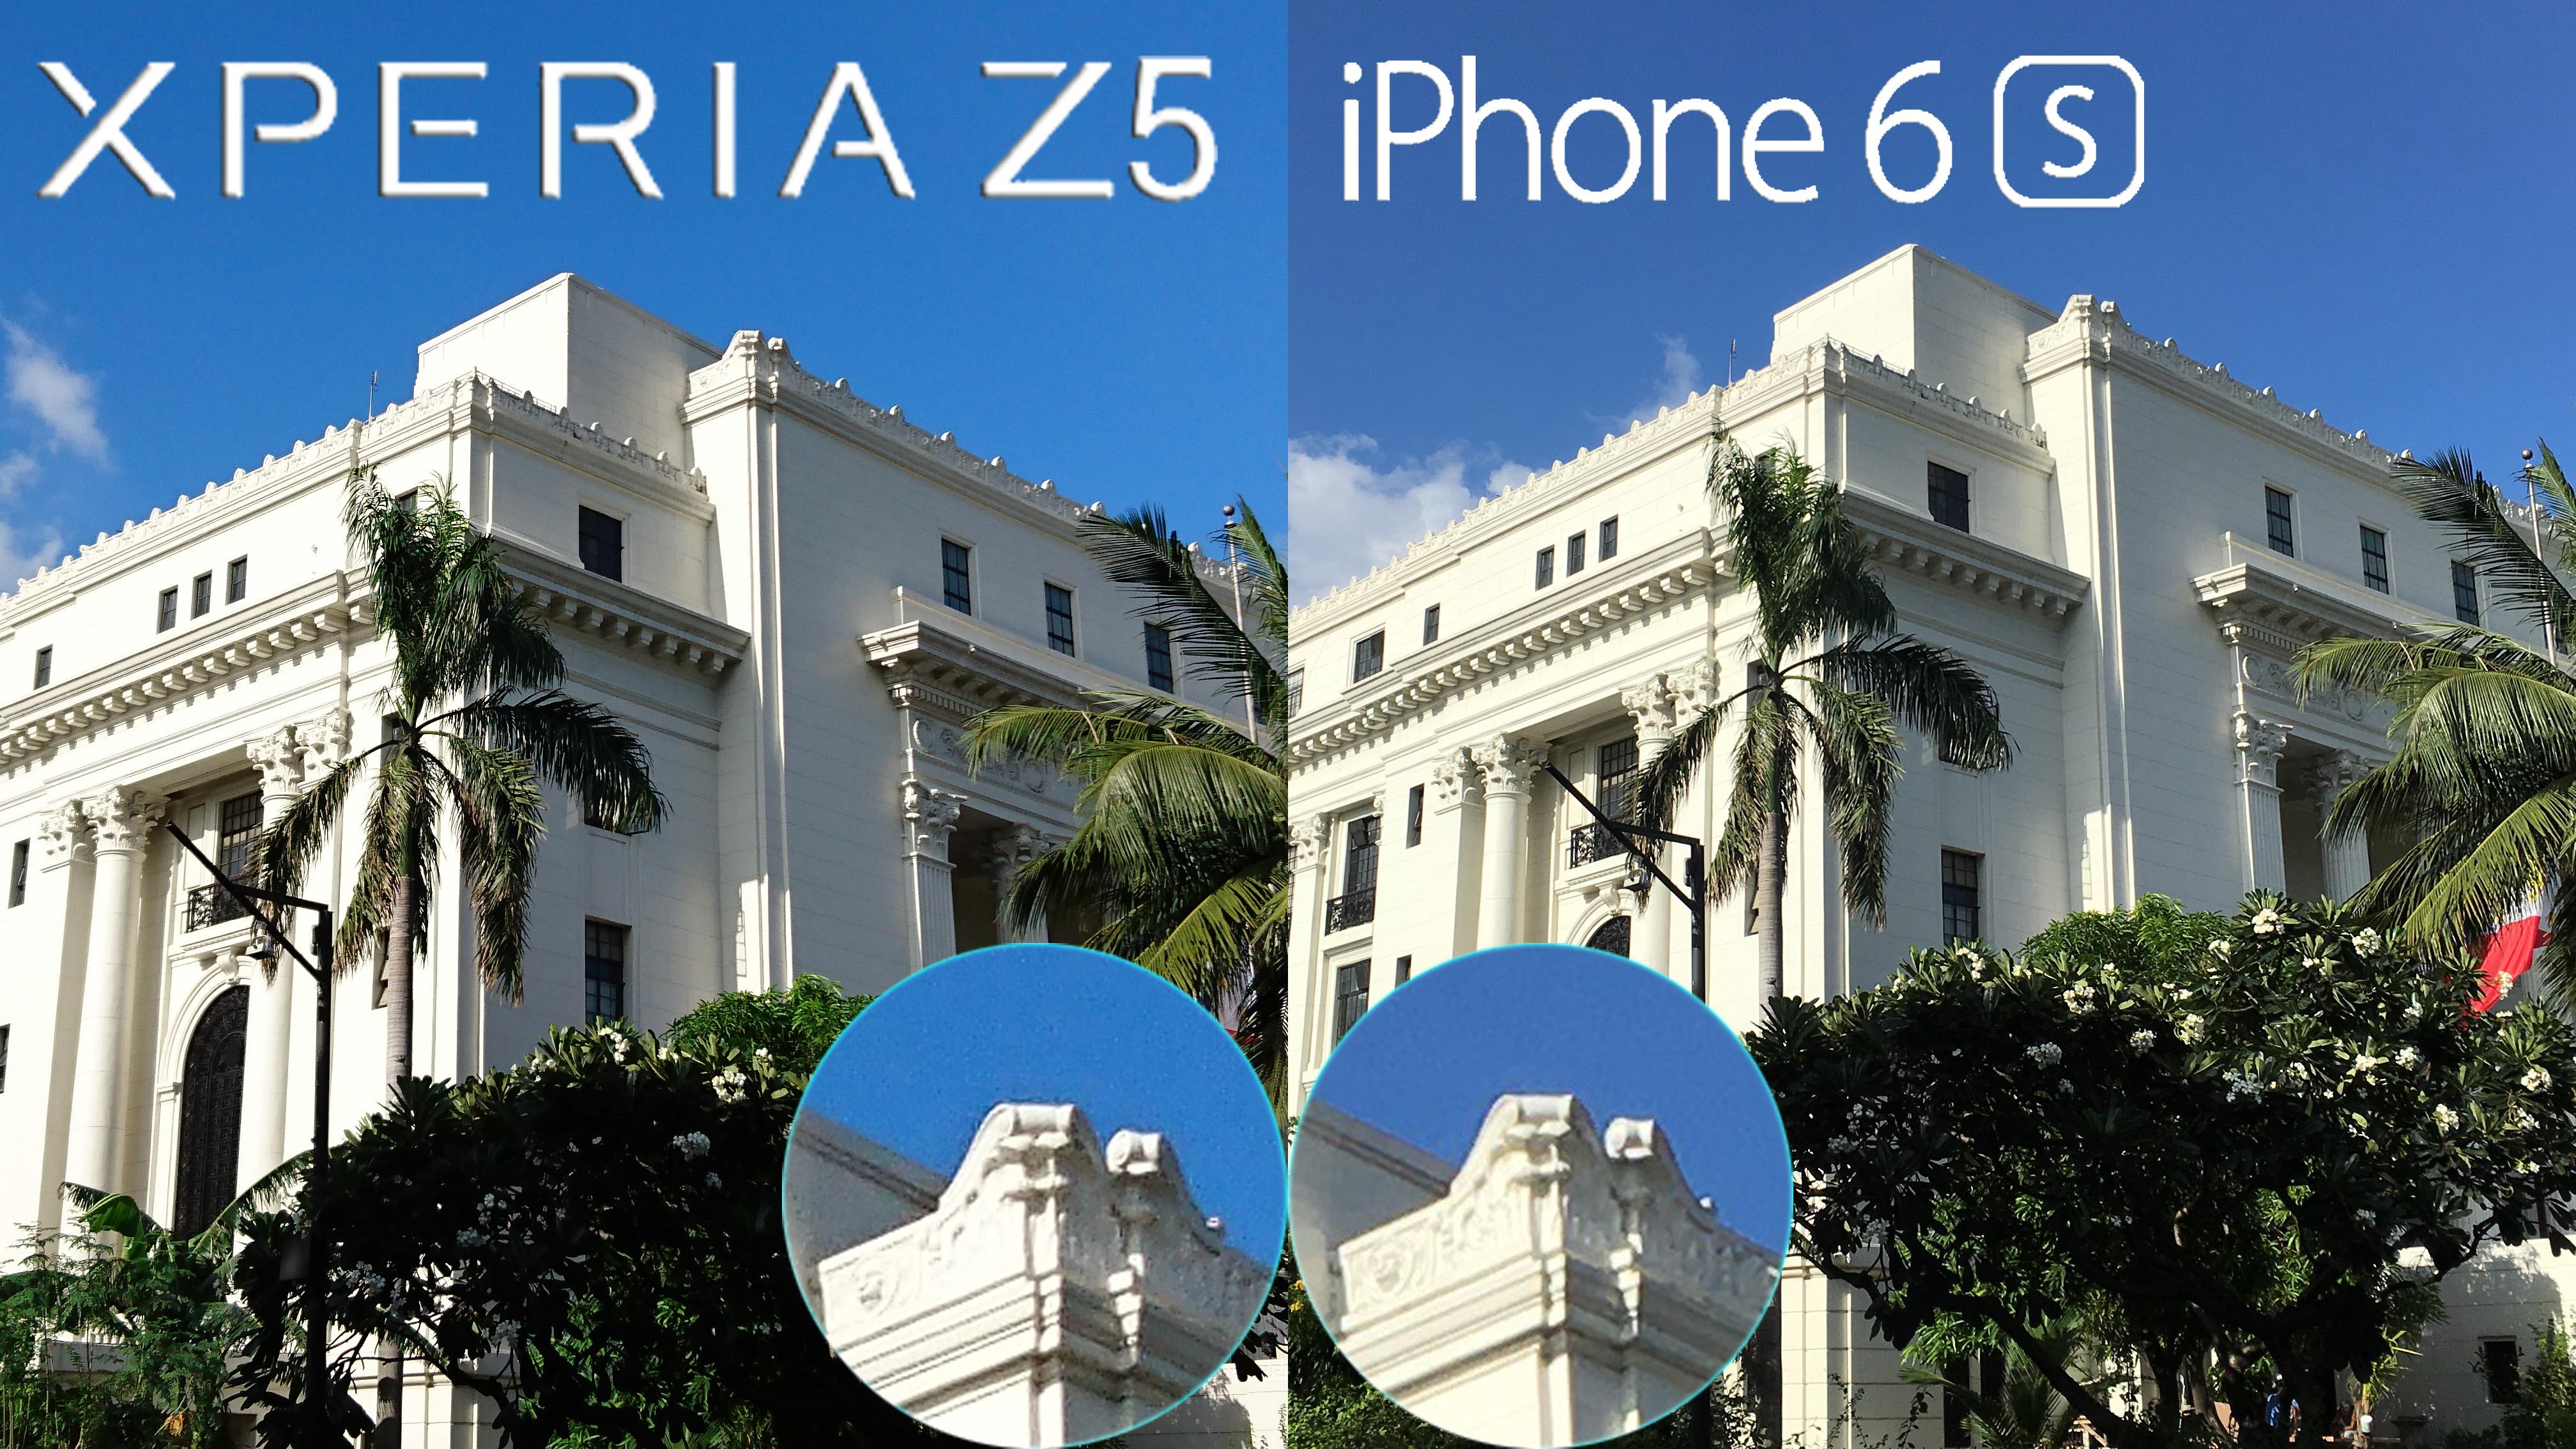 Sony Xperia Z5 vs iPhone 6s Comparison, Camera Review ...